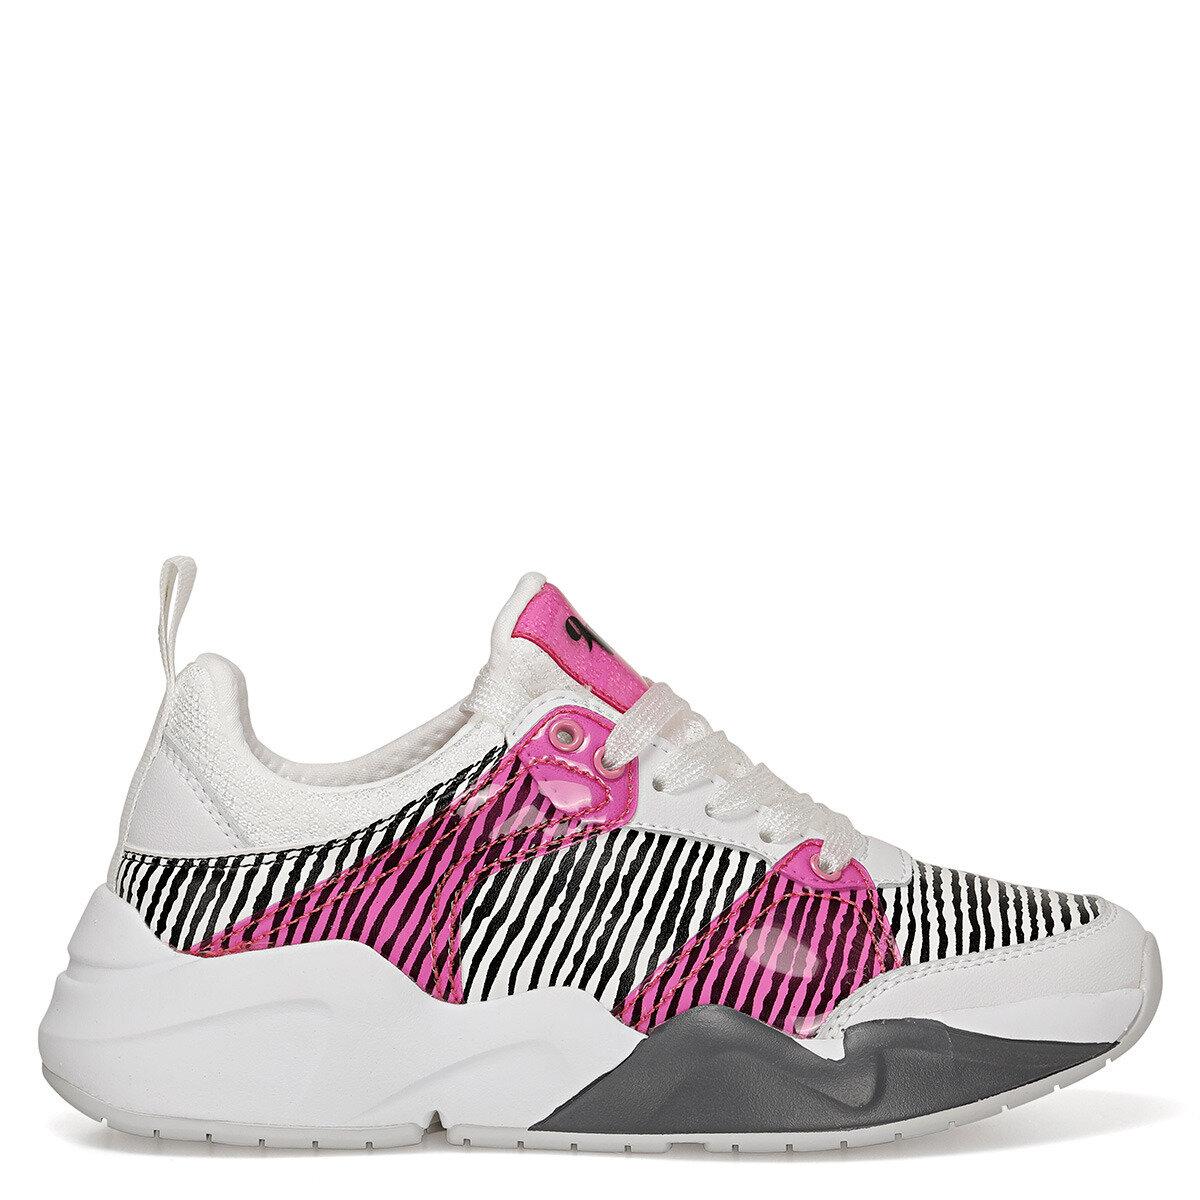 RAHAN Fuşya Kadın Sneaker